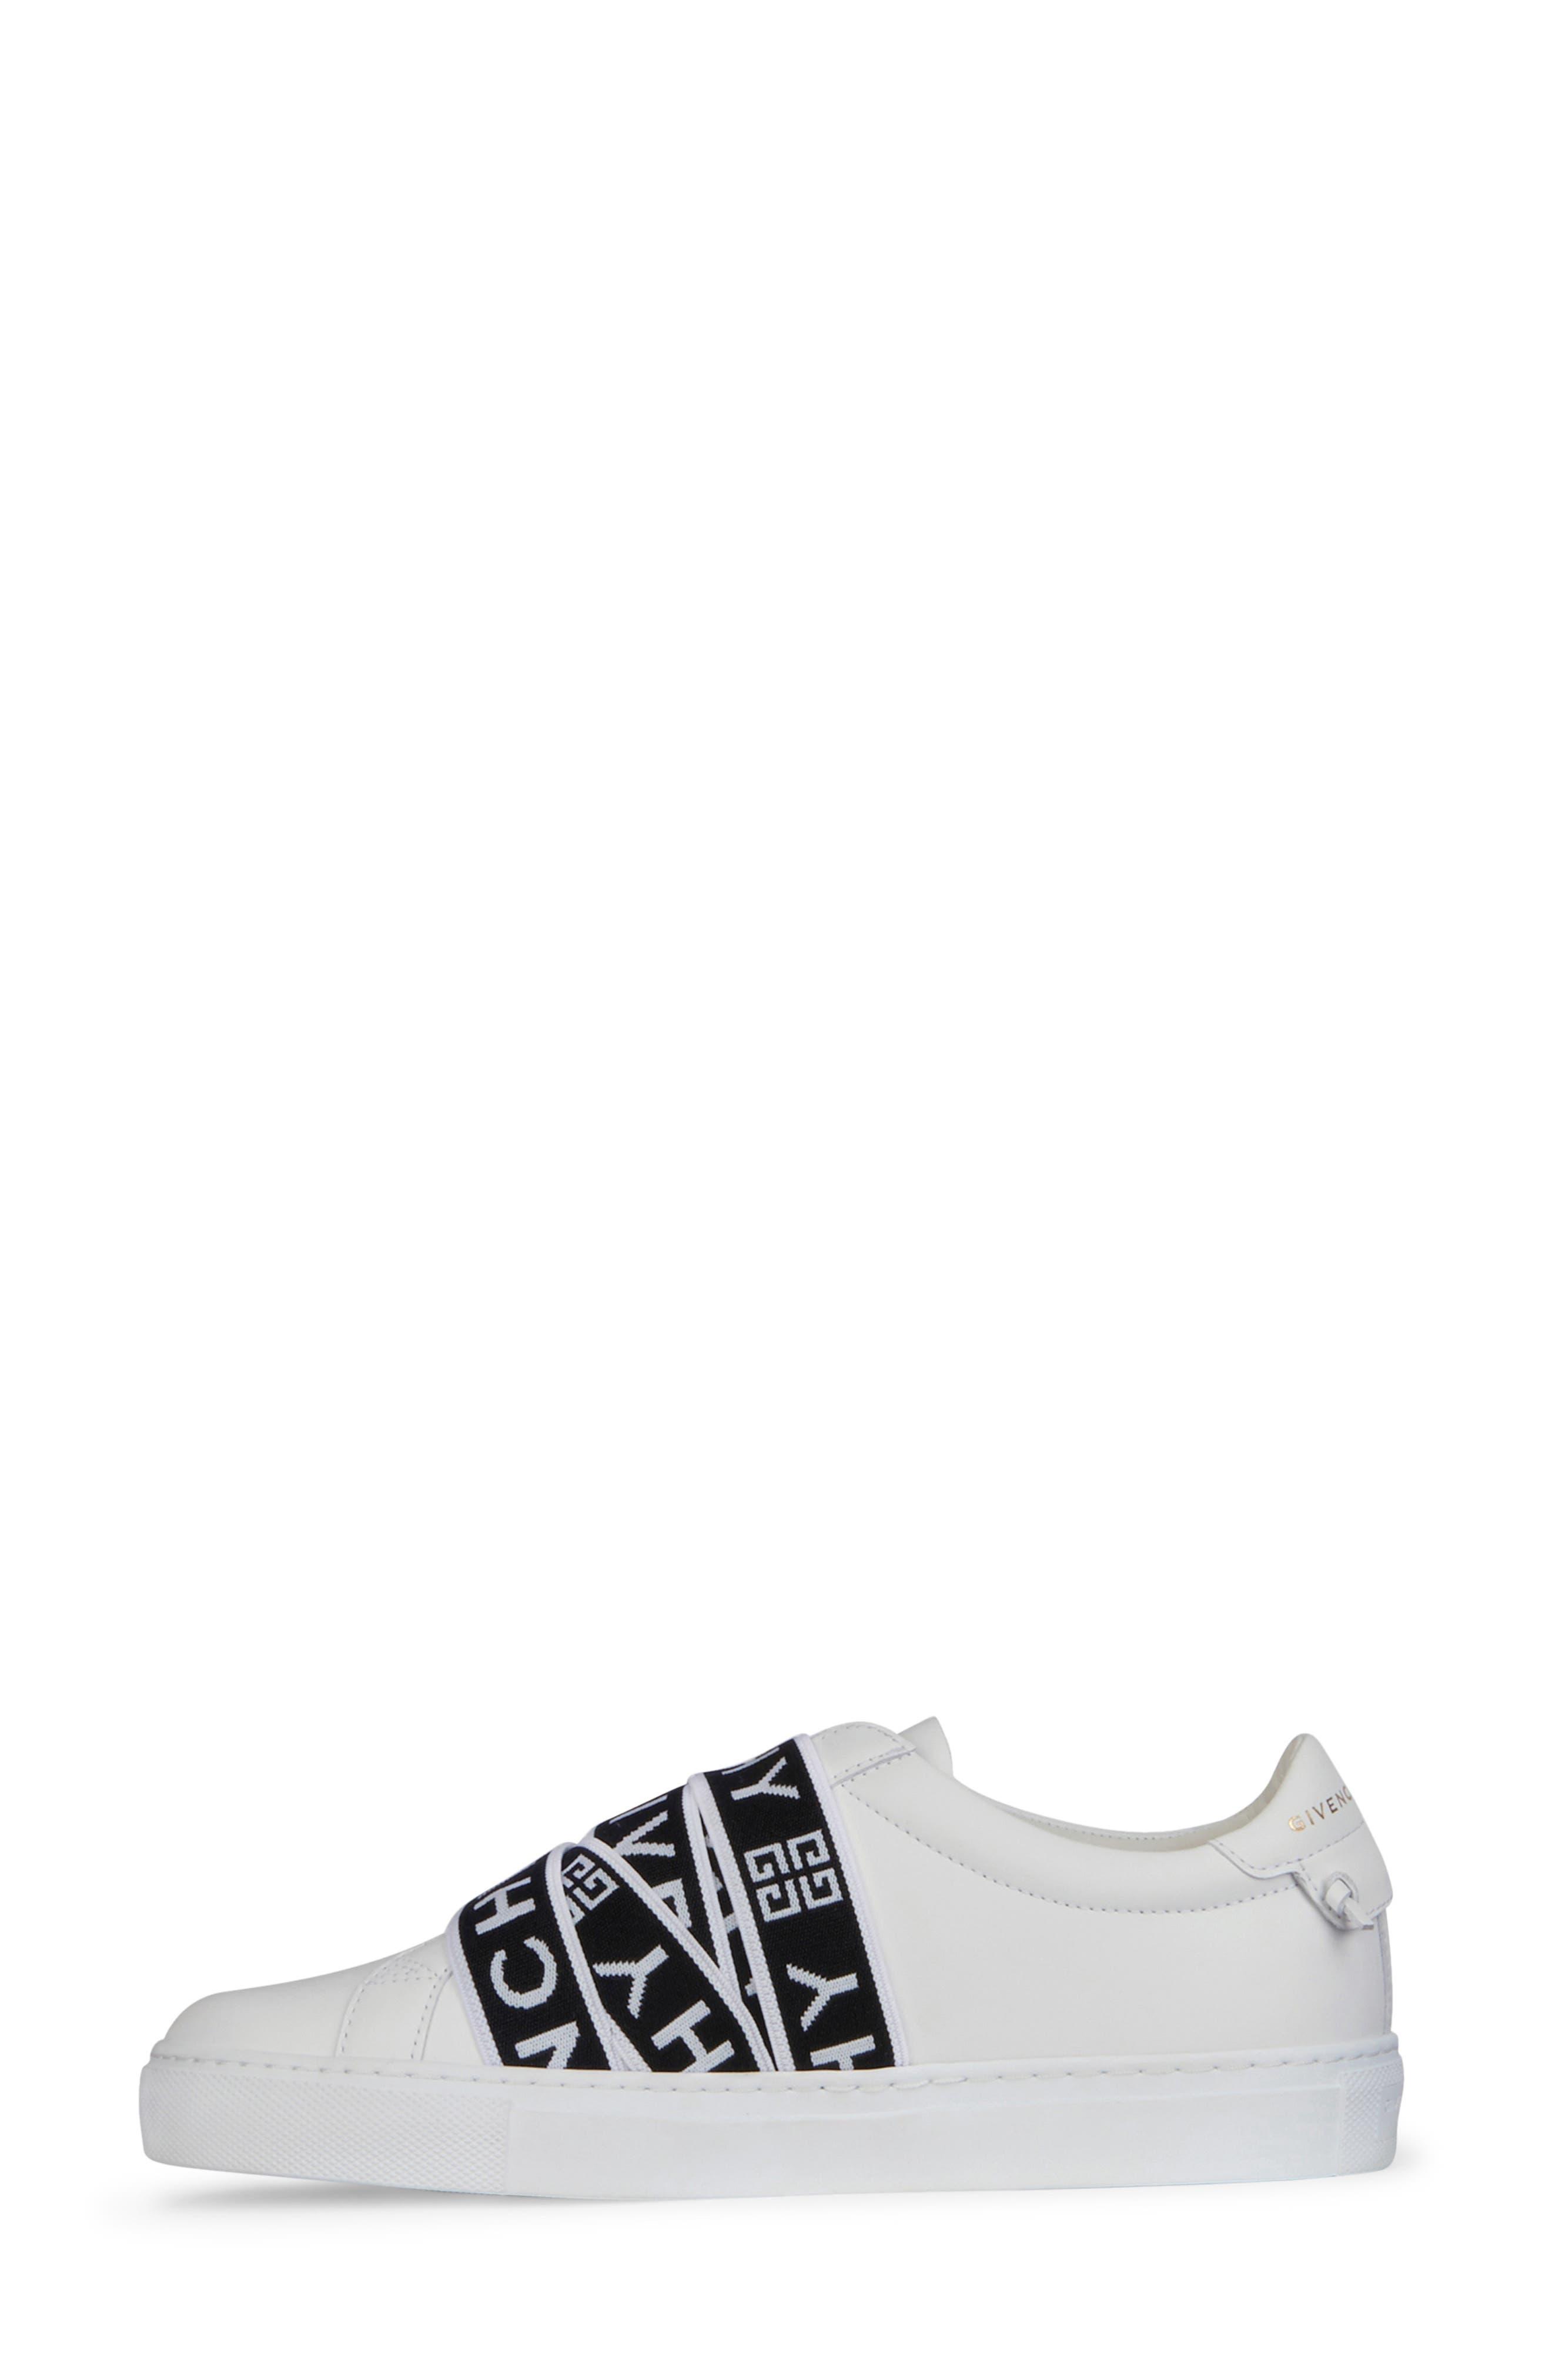 GIVENCHY,                             Urban Street Logo Strap Sneaker,                             Alternate thumbnail 6, color,                             WHITE/ BLACK